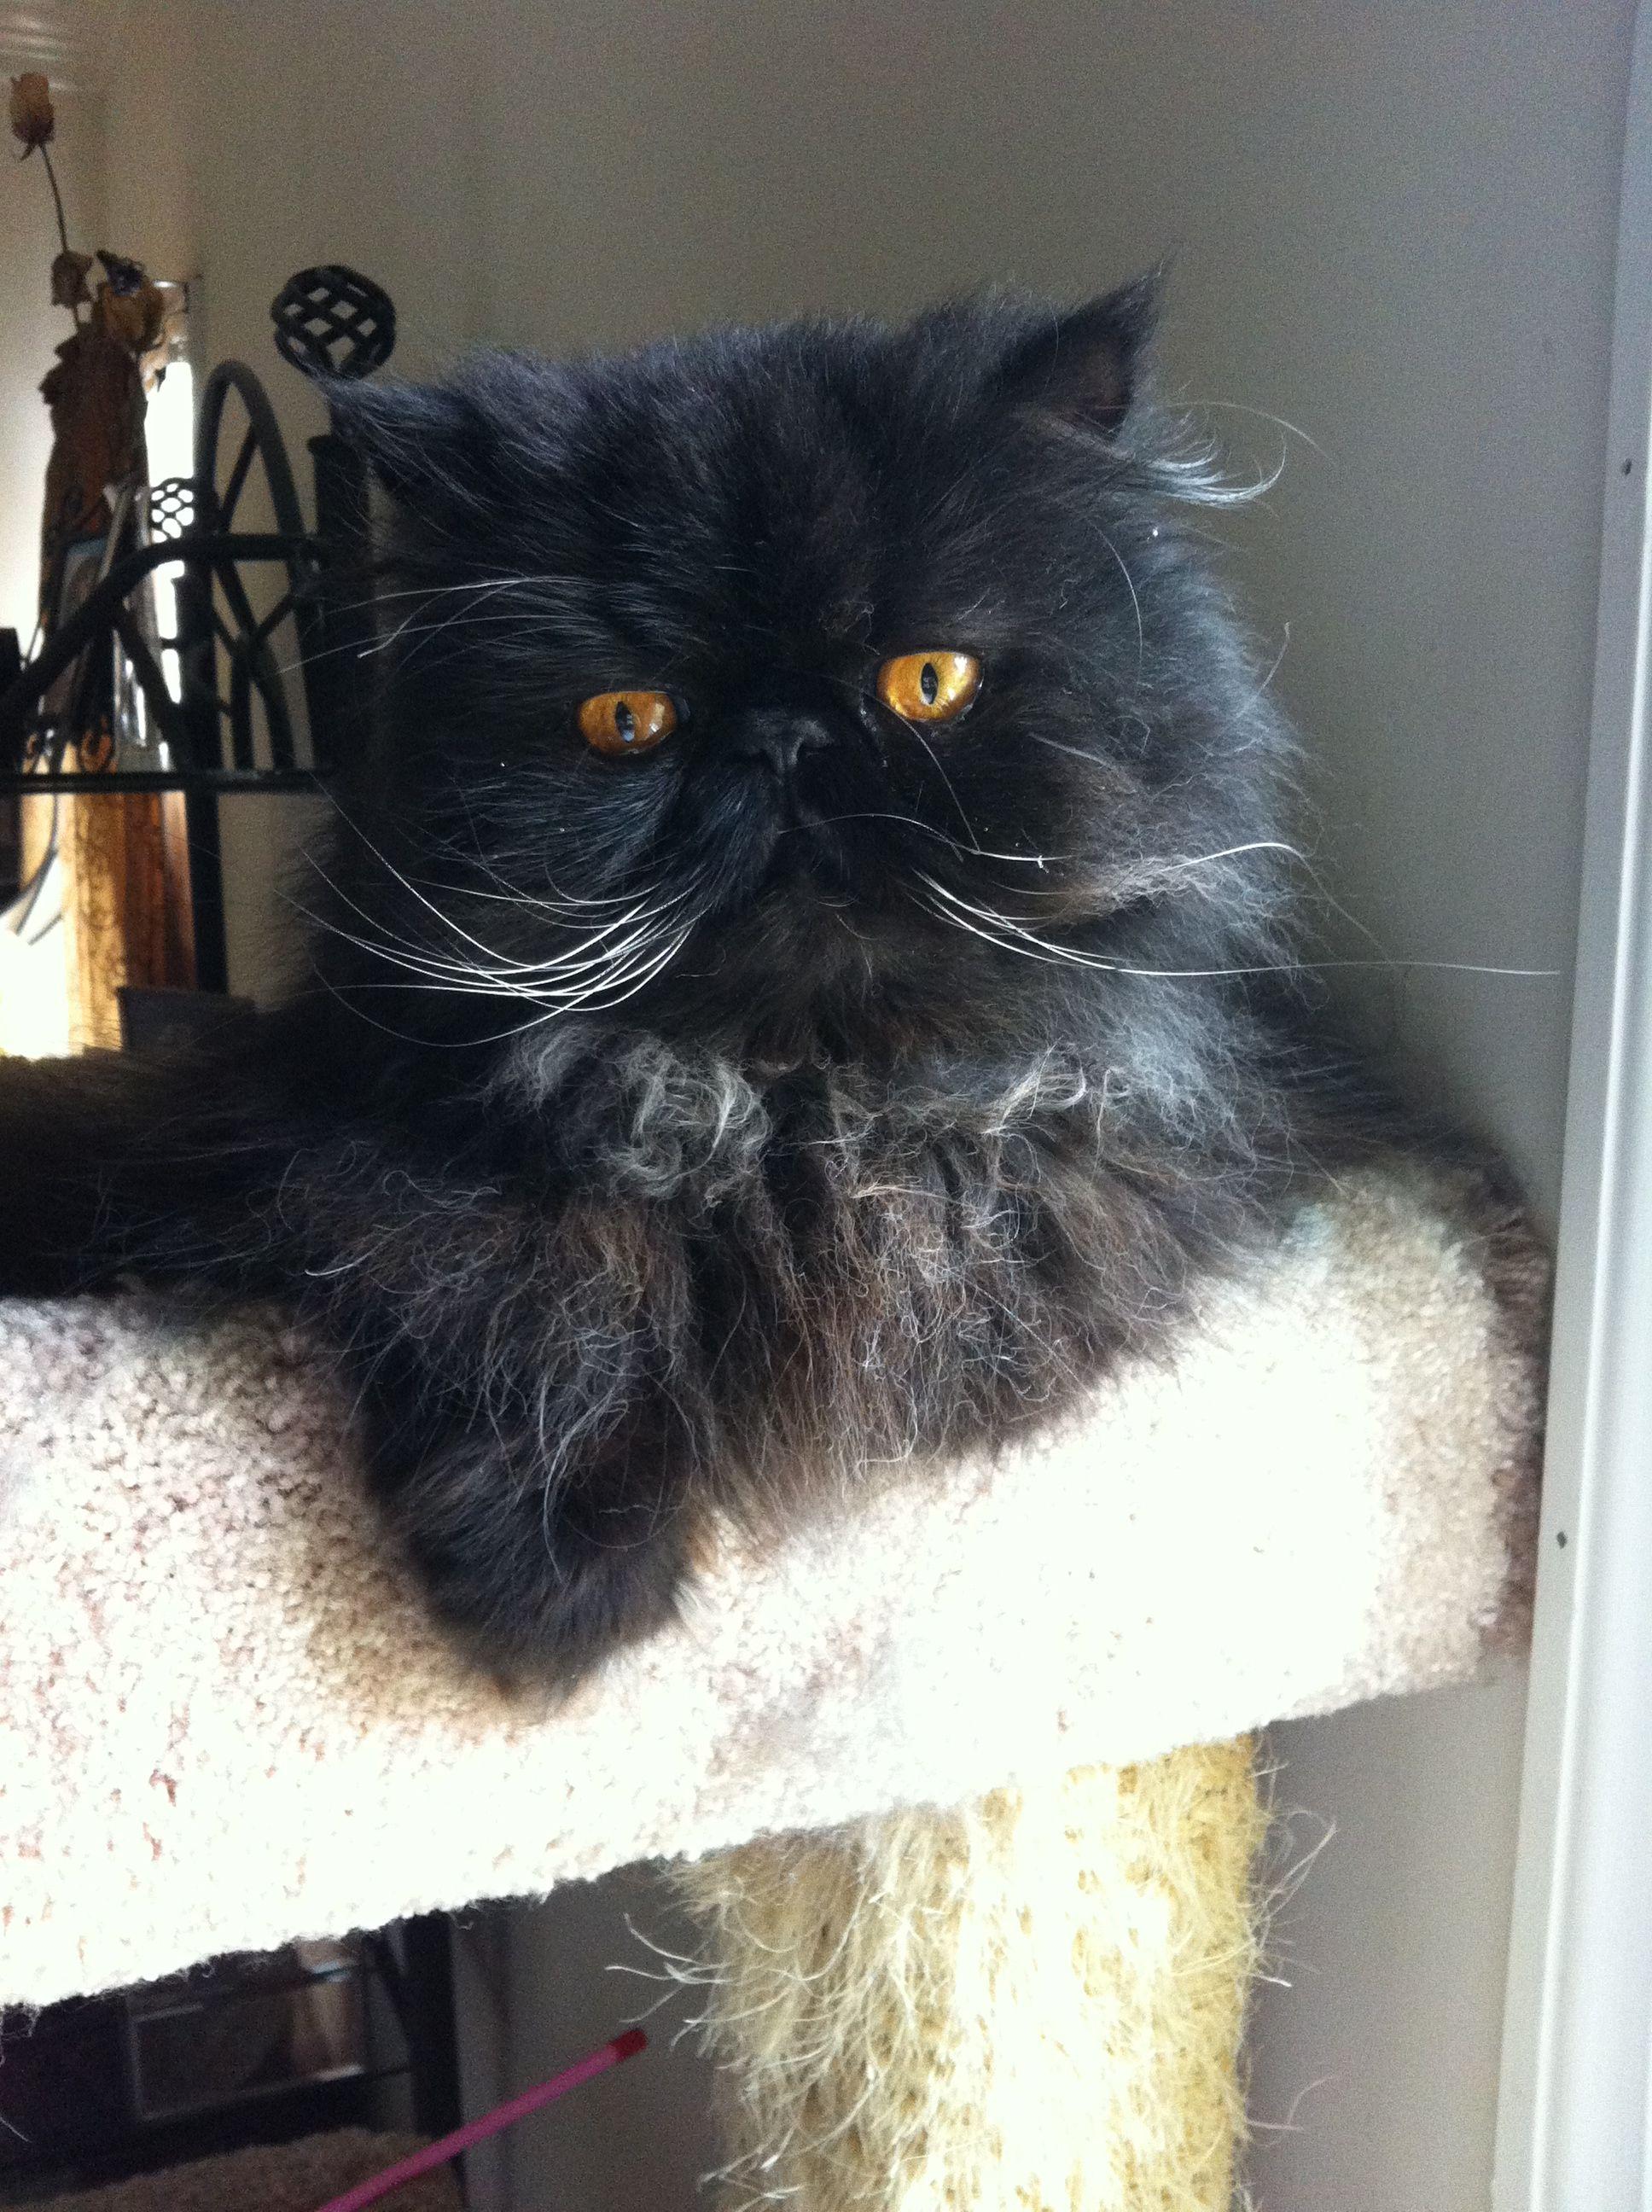 Black Persian Cat This Cat Looks Just Like Bijou Lefleur Mary Persiancatkitty Pretty Cats Beautiful Cats Cute Cats